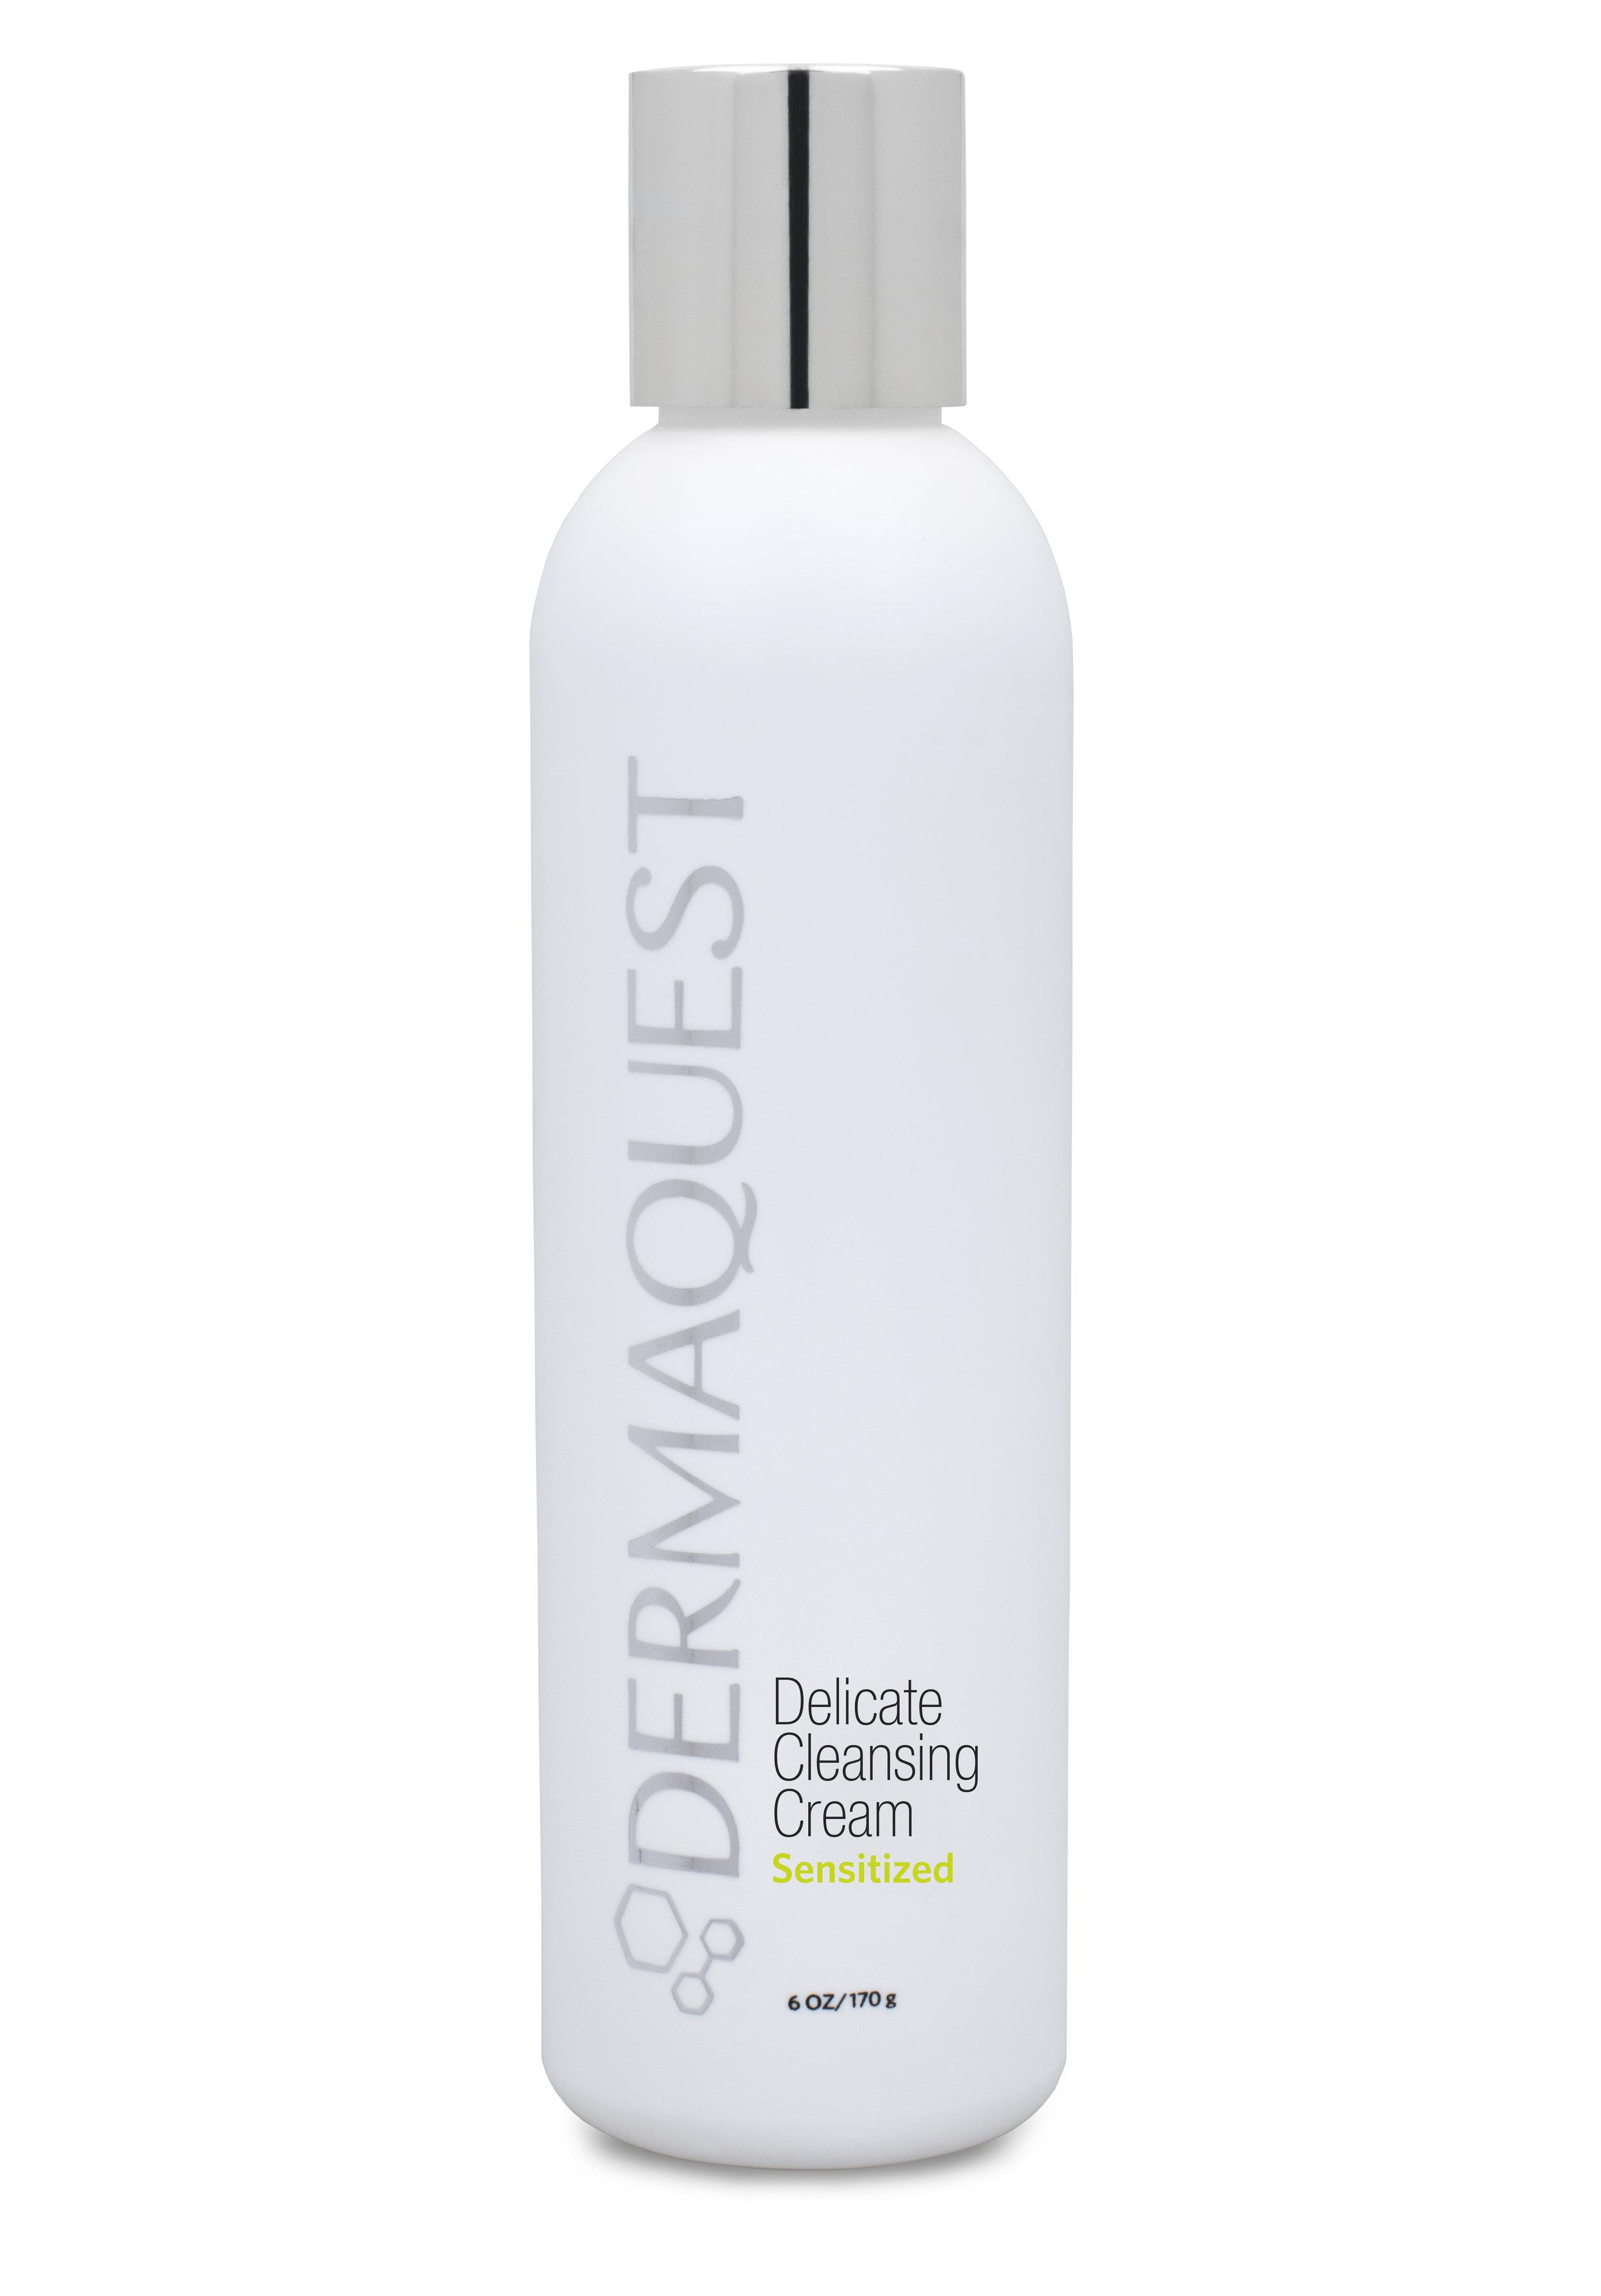 Sensitized Delicate Cleansing Cream 6oz.jpg